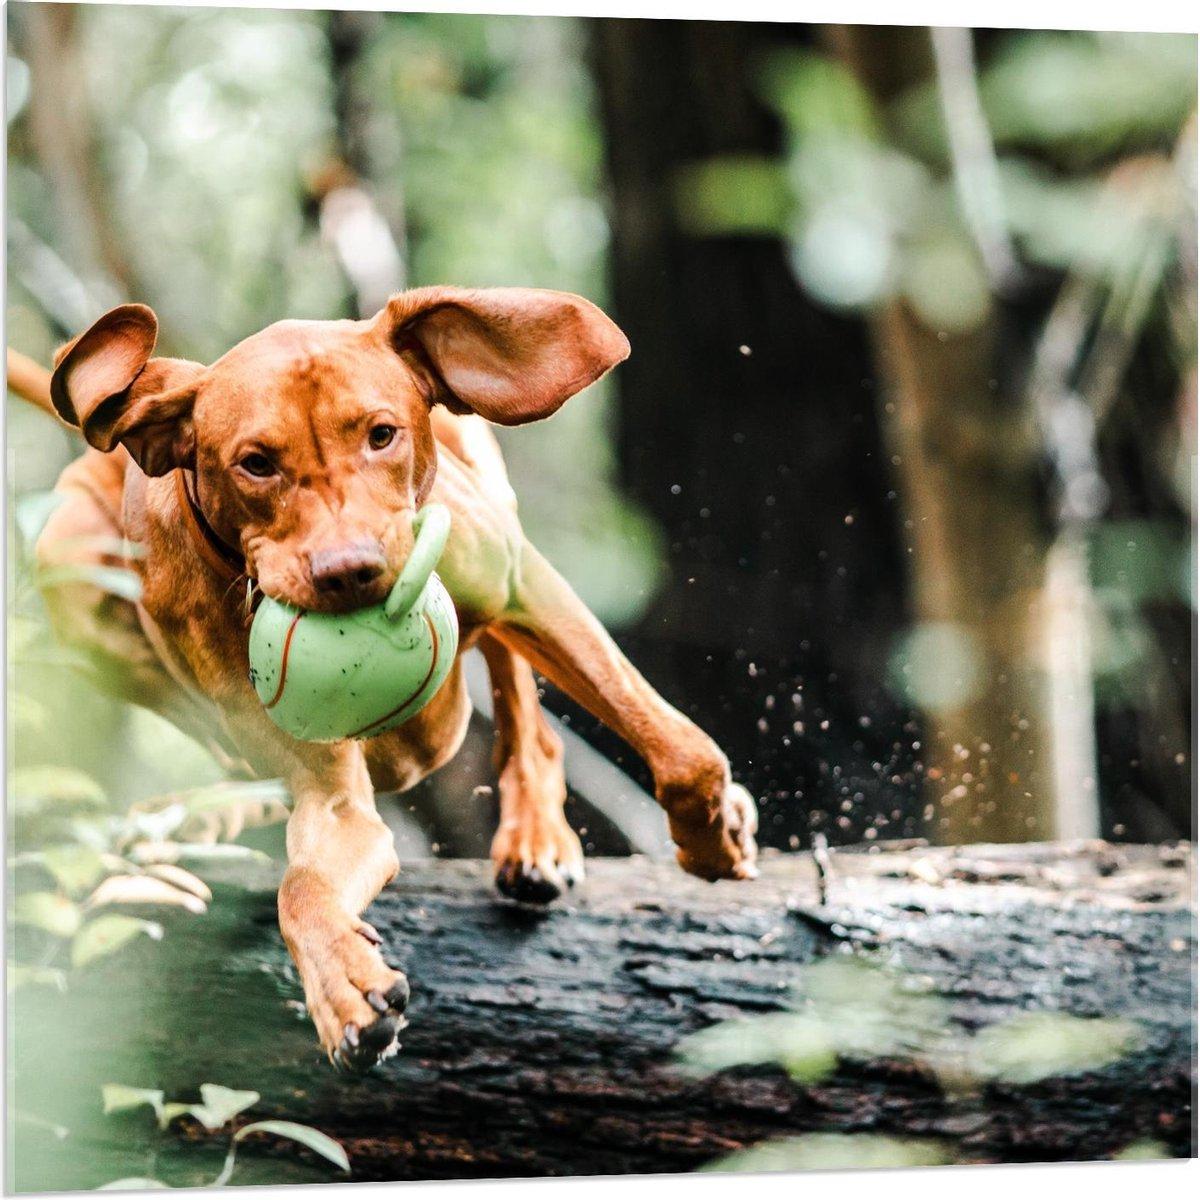 Plexiglas - Springende Hond over Boomstam met Speeltje - 80x80cm Foto op Plexiglas (Wanddecoratie op Plexiglas)